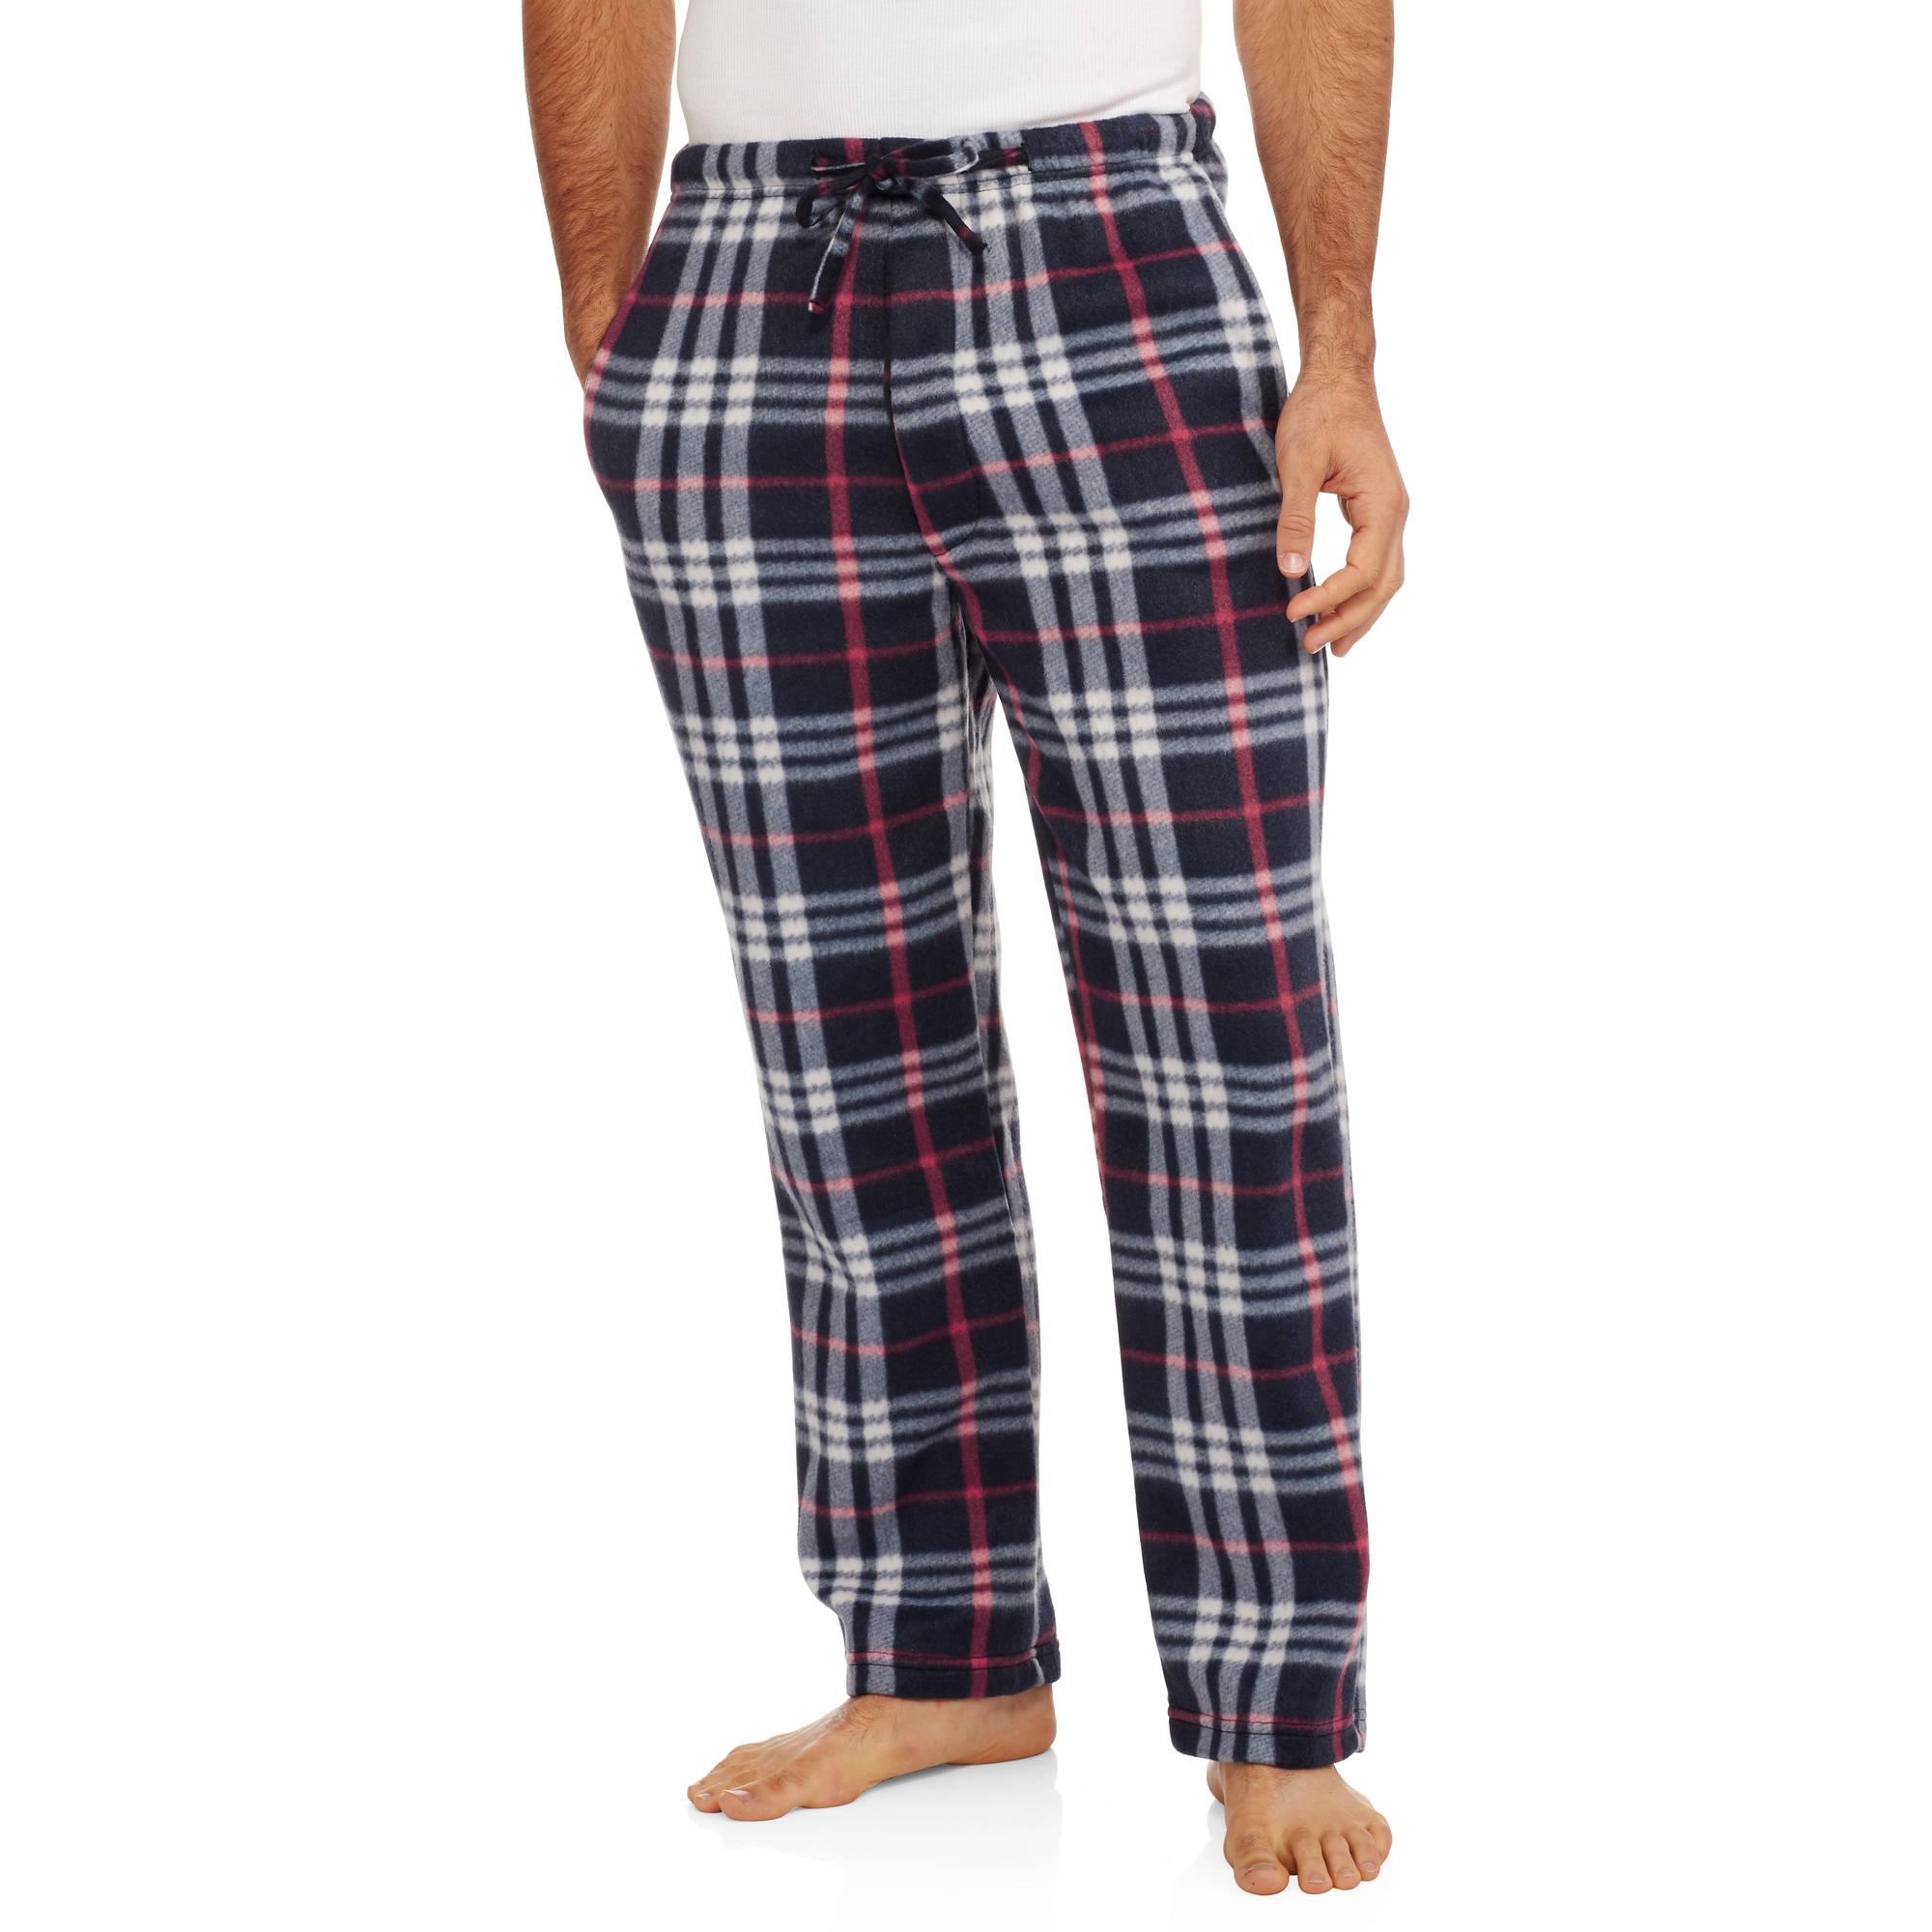 Big Men's Plaid Printed Polar Fleece Pants, 2XL